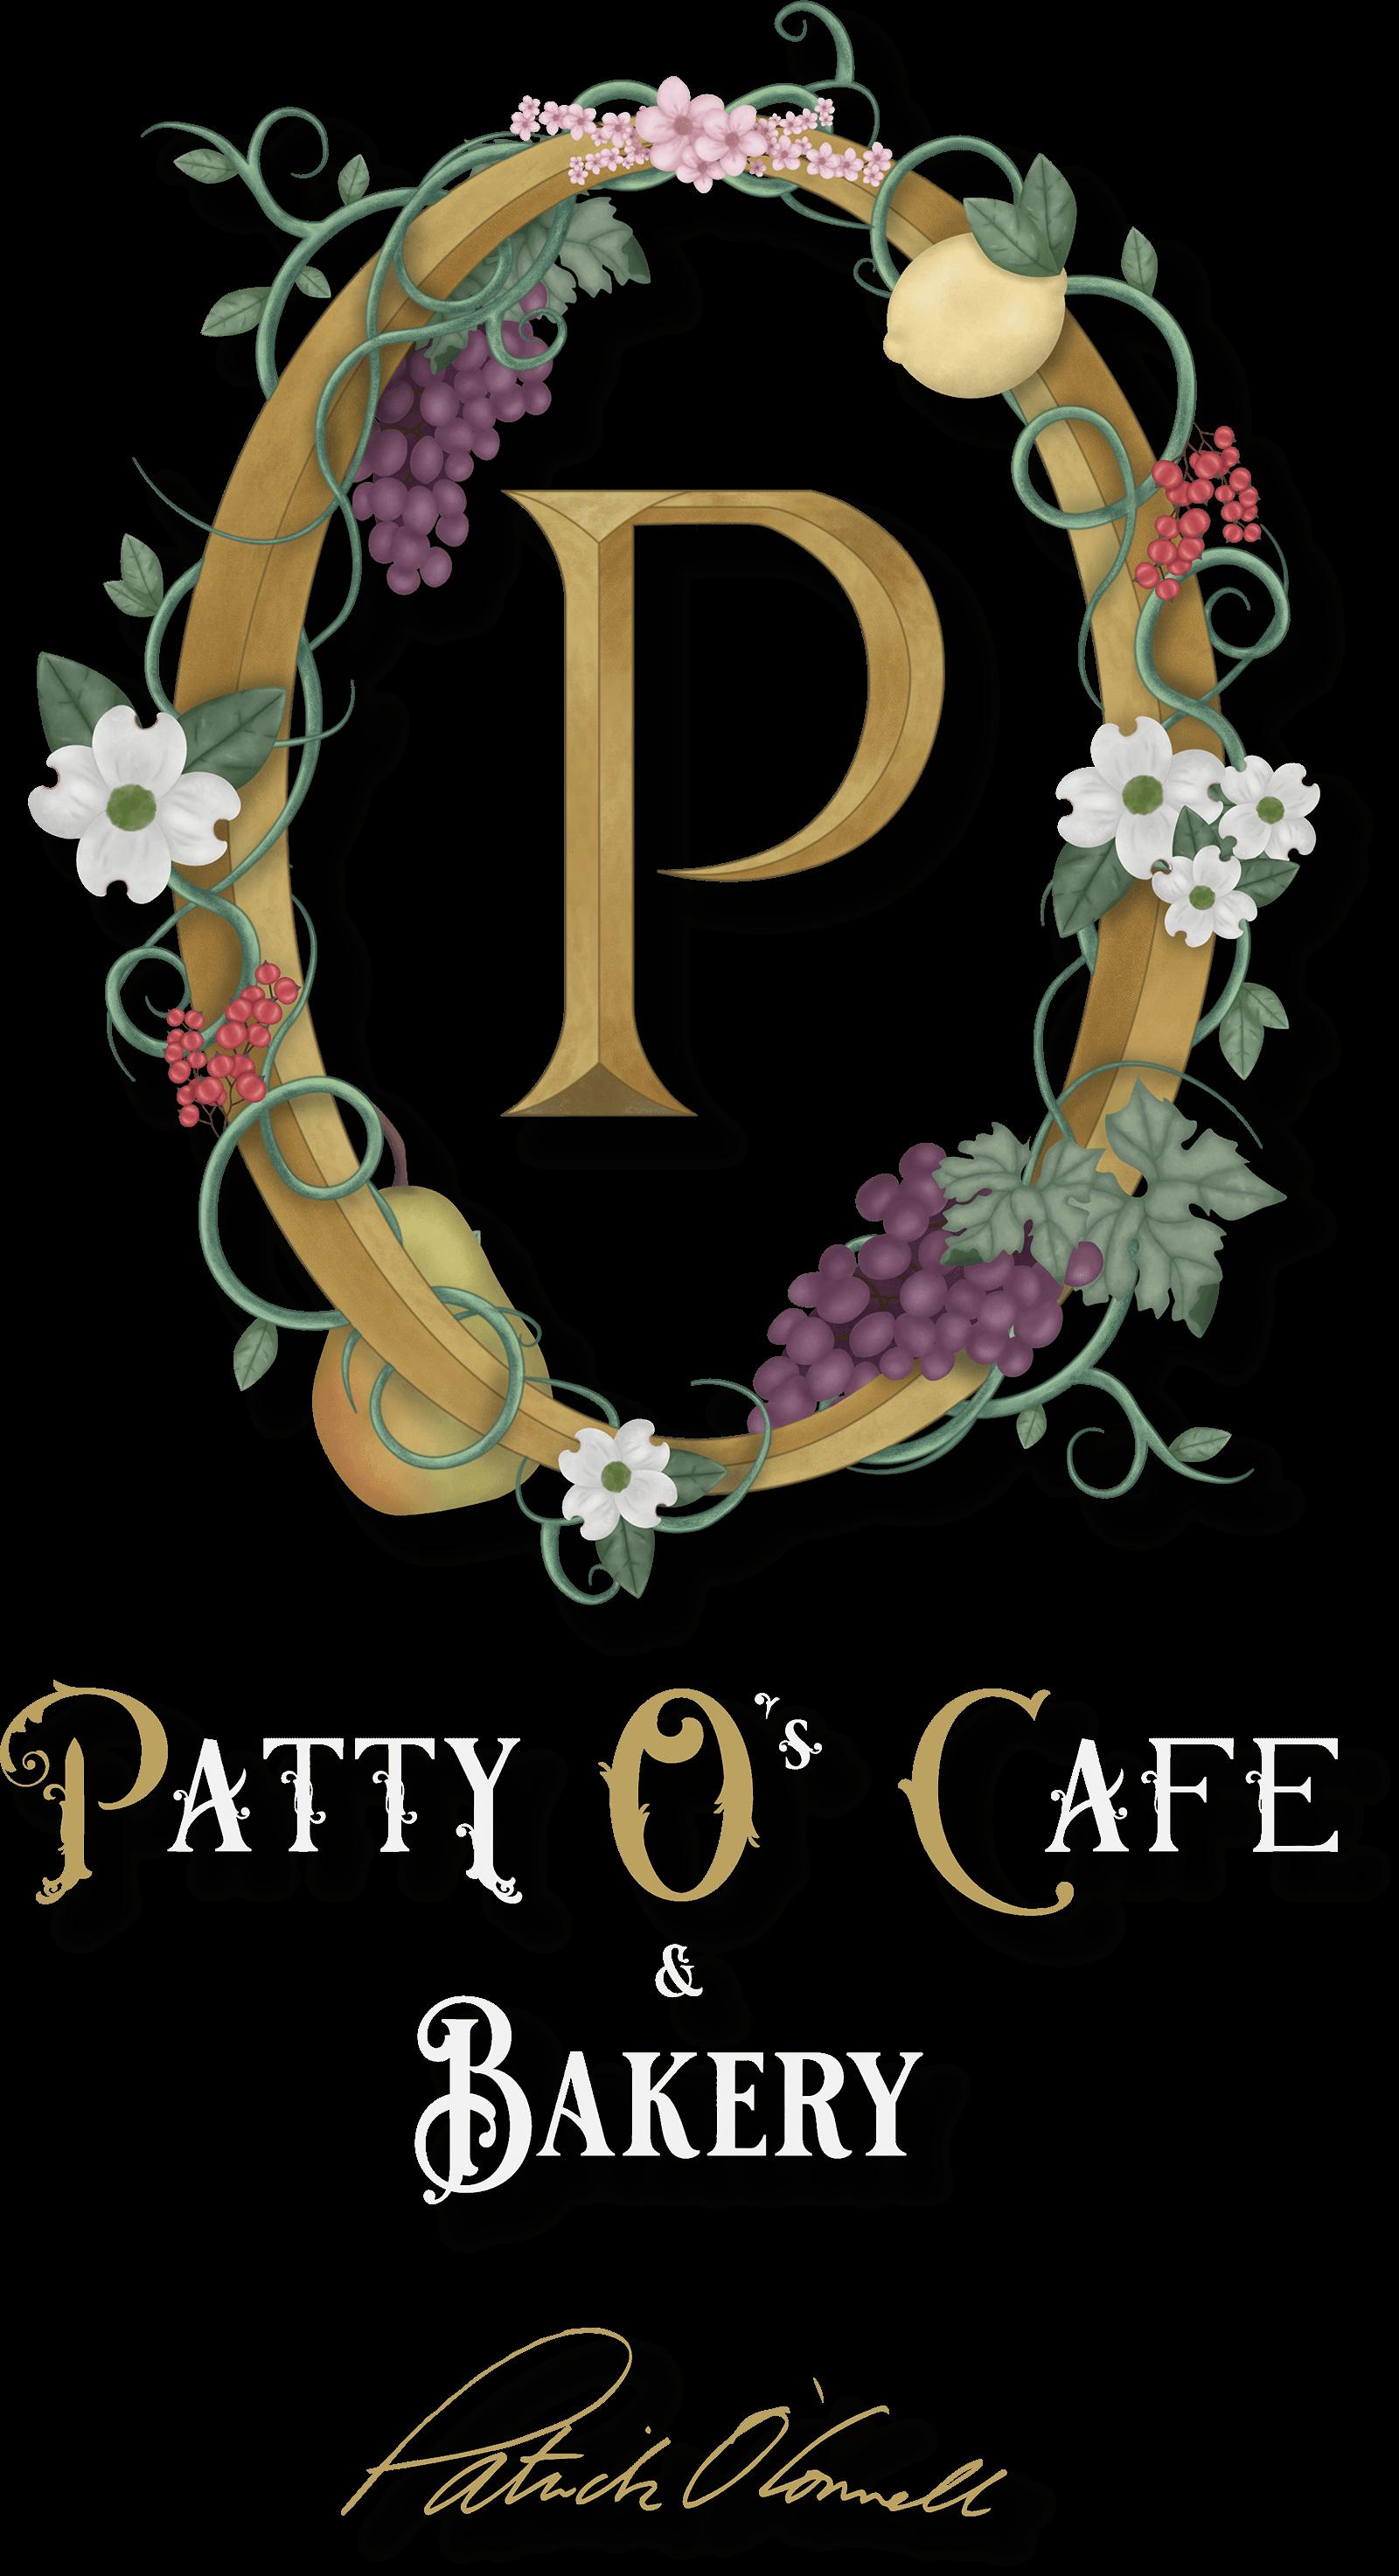 The Patty O's Cafe and Bakery logo